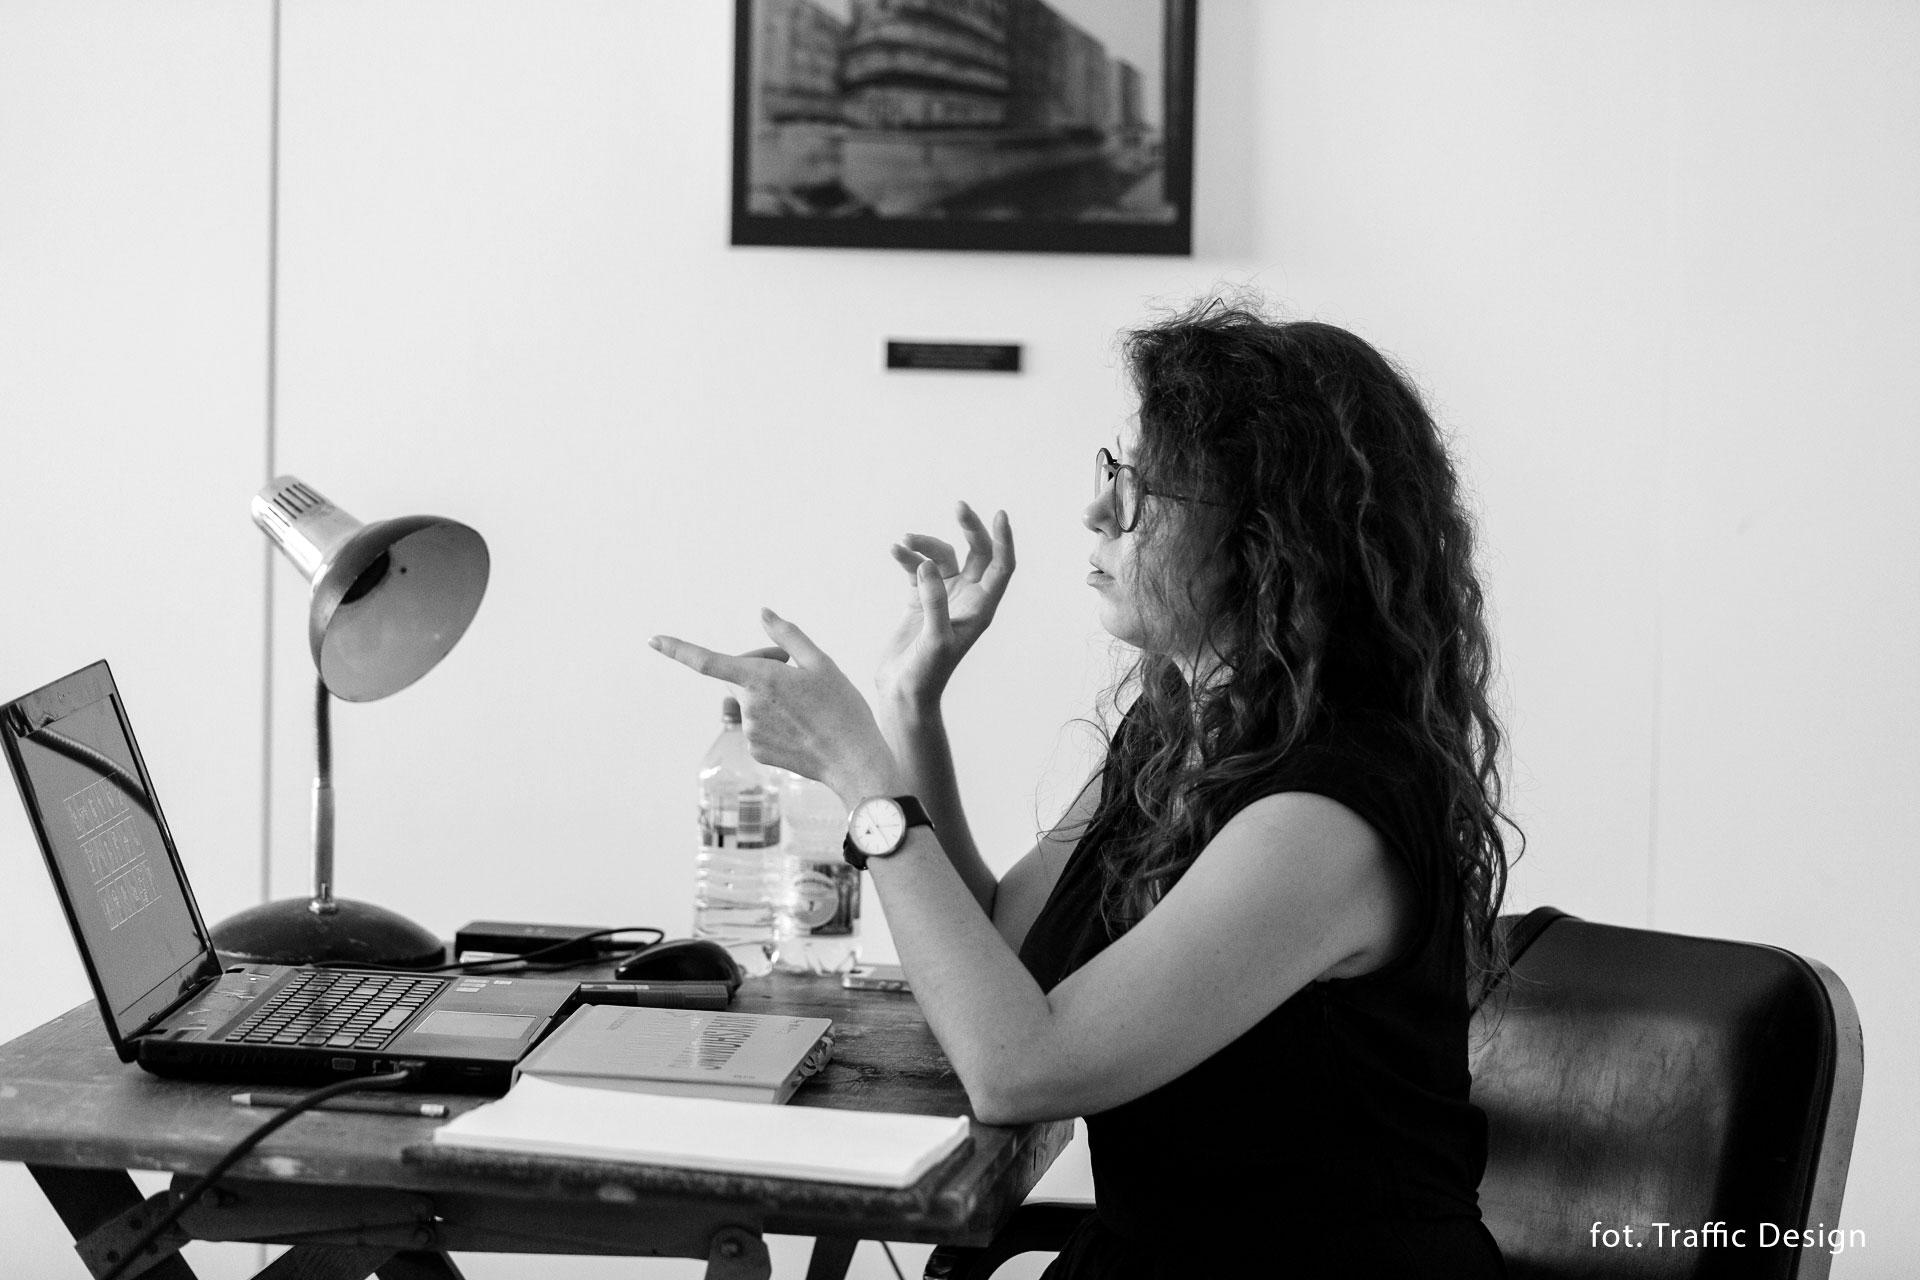 workshop lecture